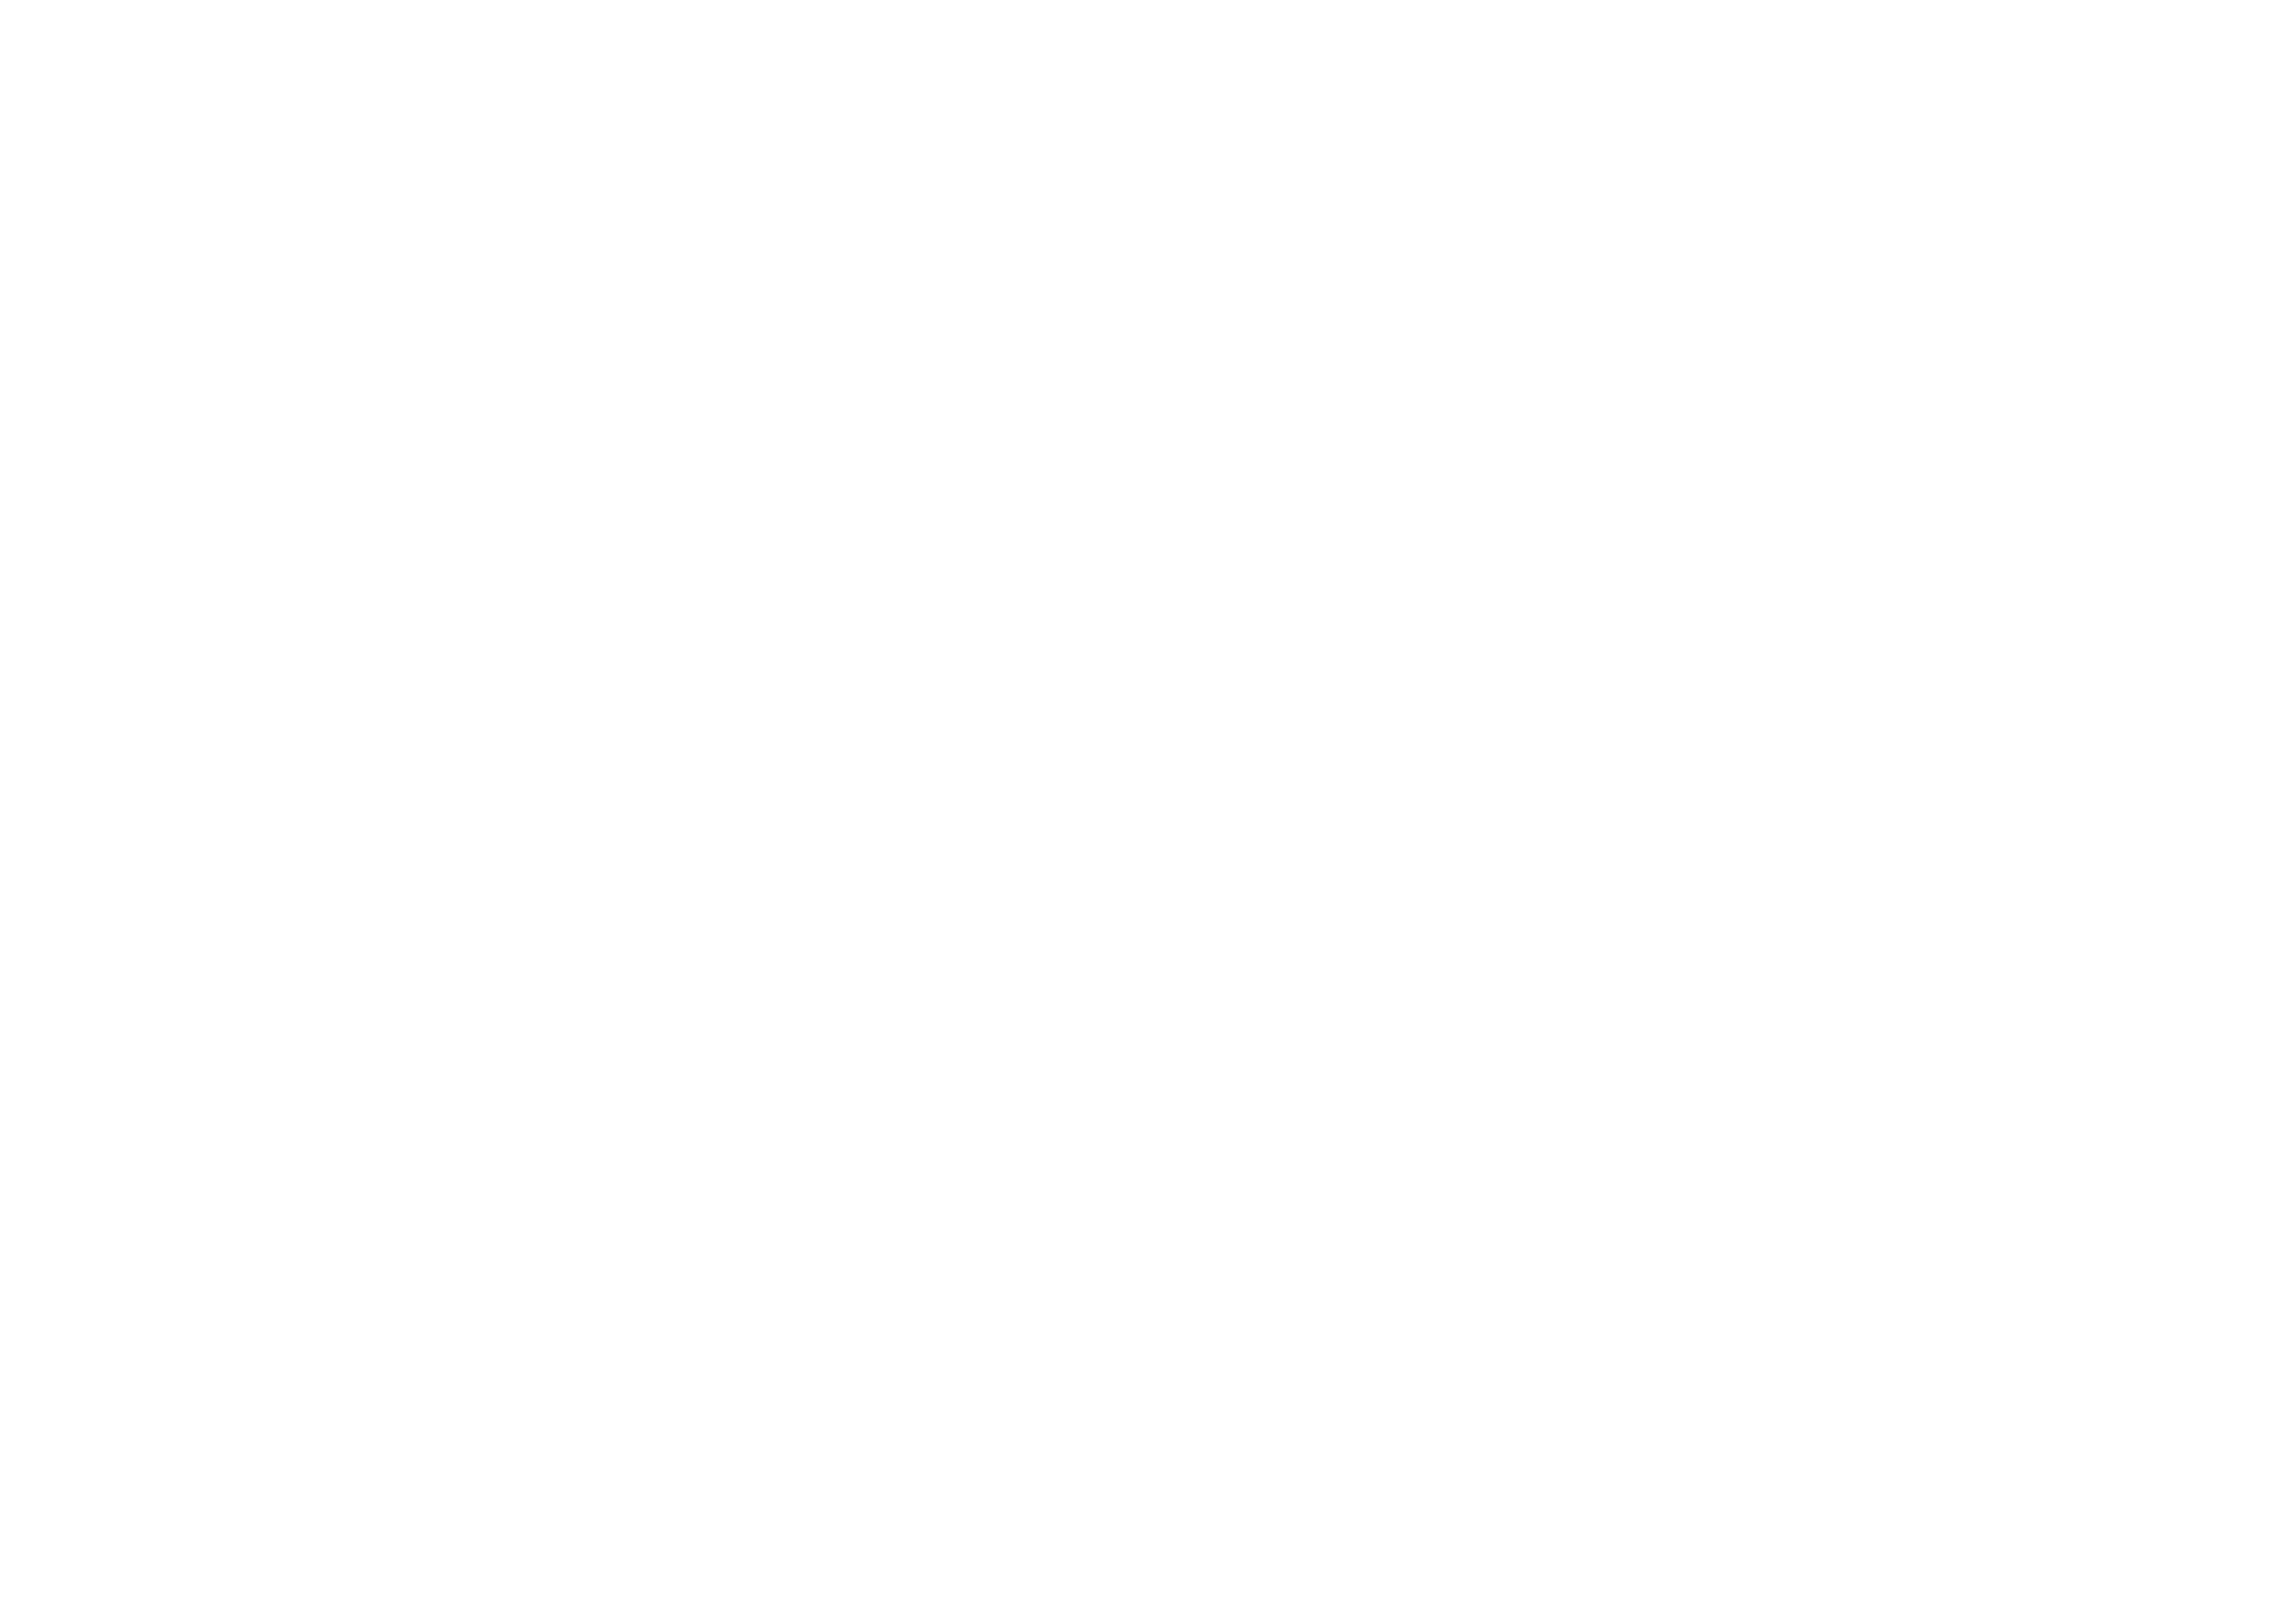 AÏA | Freelance Content & Digital Marketing à Aix - Marseille